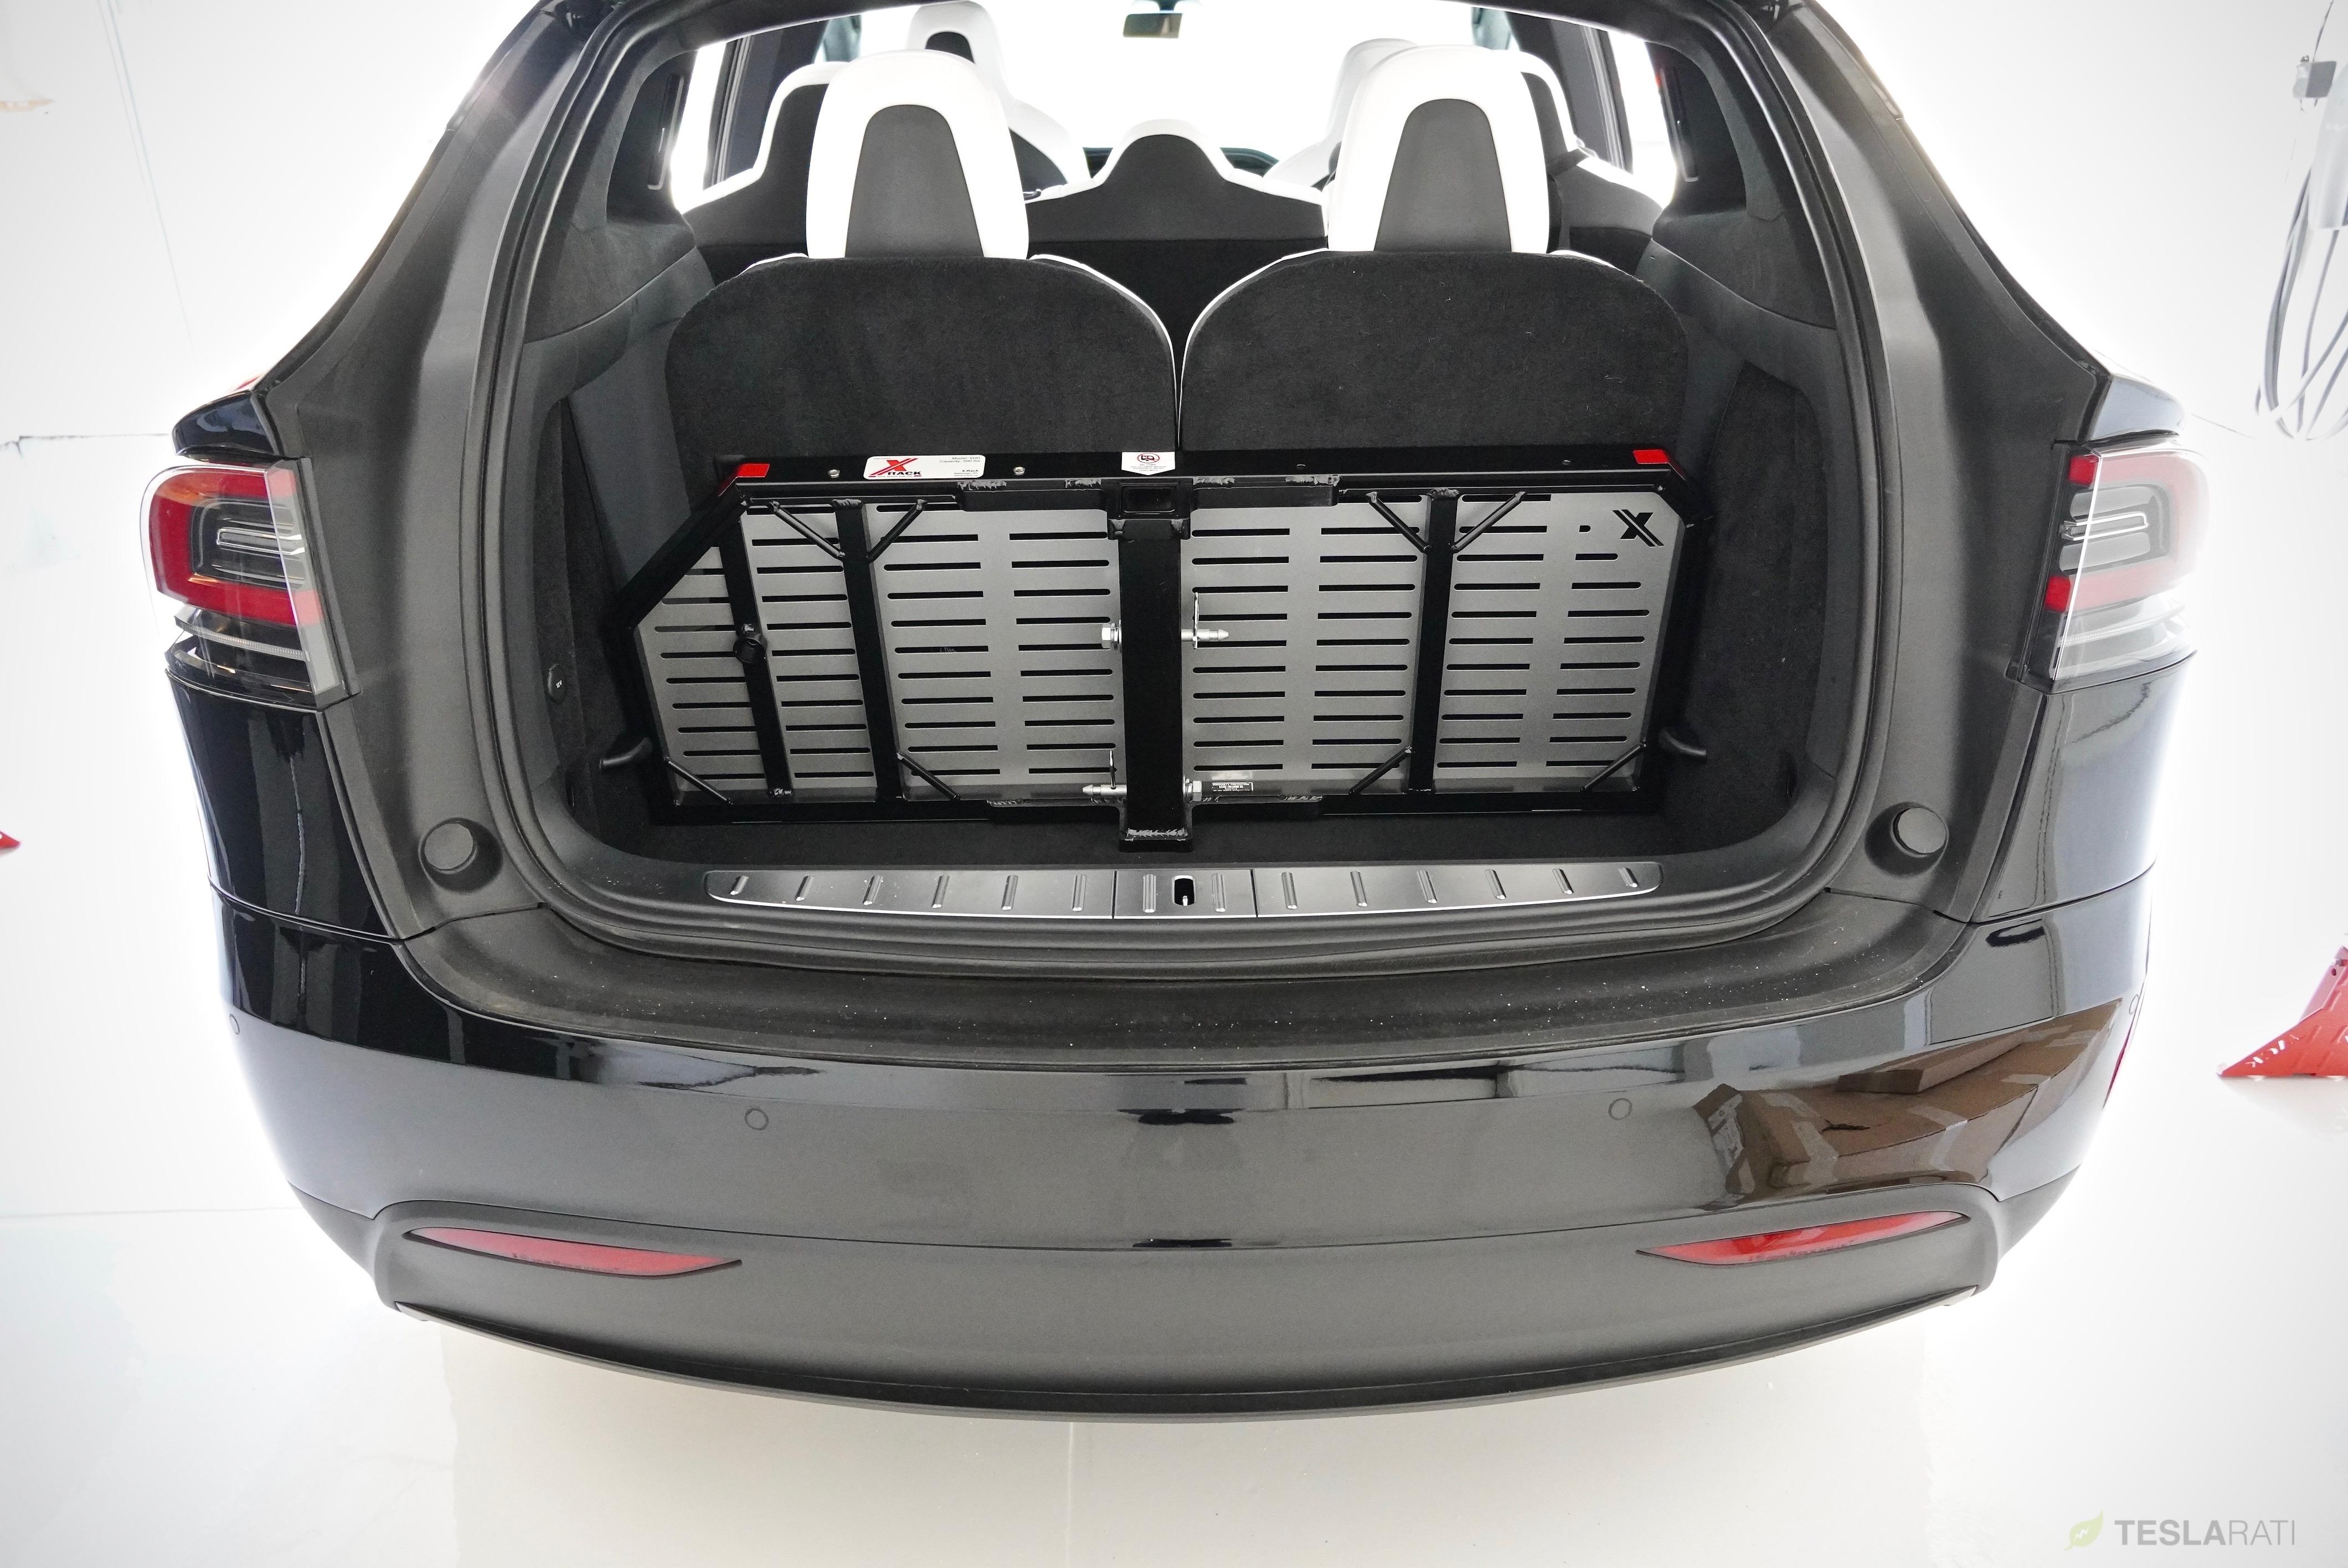 tesla-model-x-rack-trunk-stoarge-upright